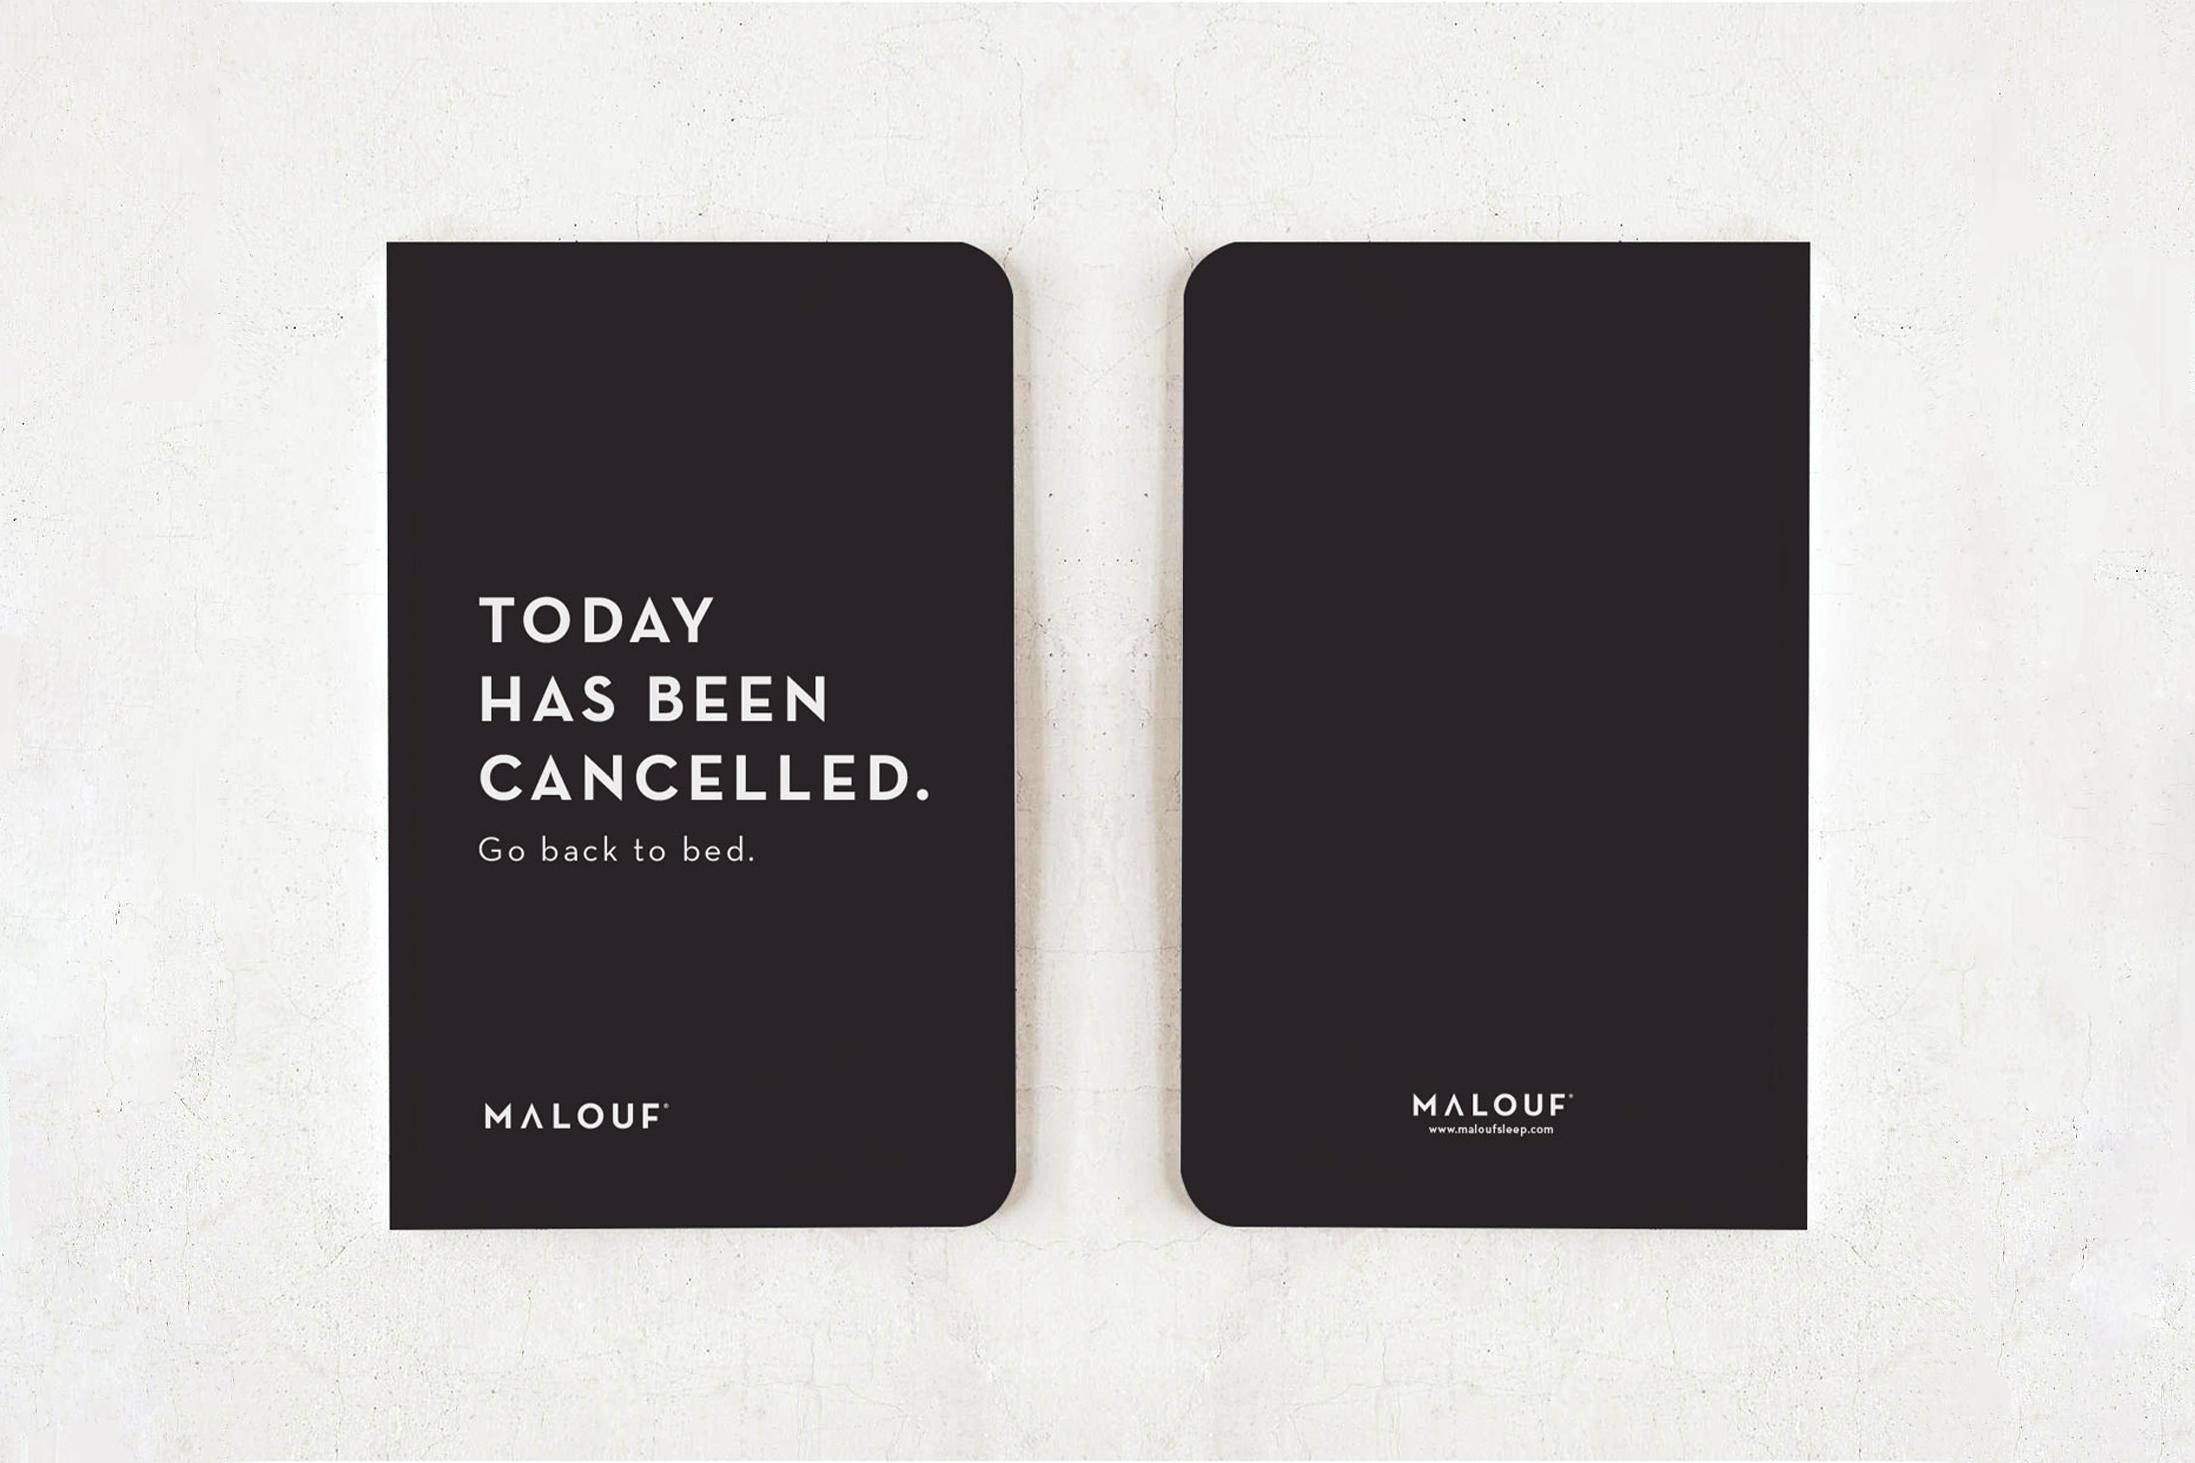 MALOUF_Notebooks_Option5.jpg